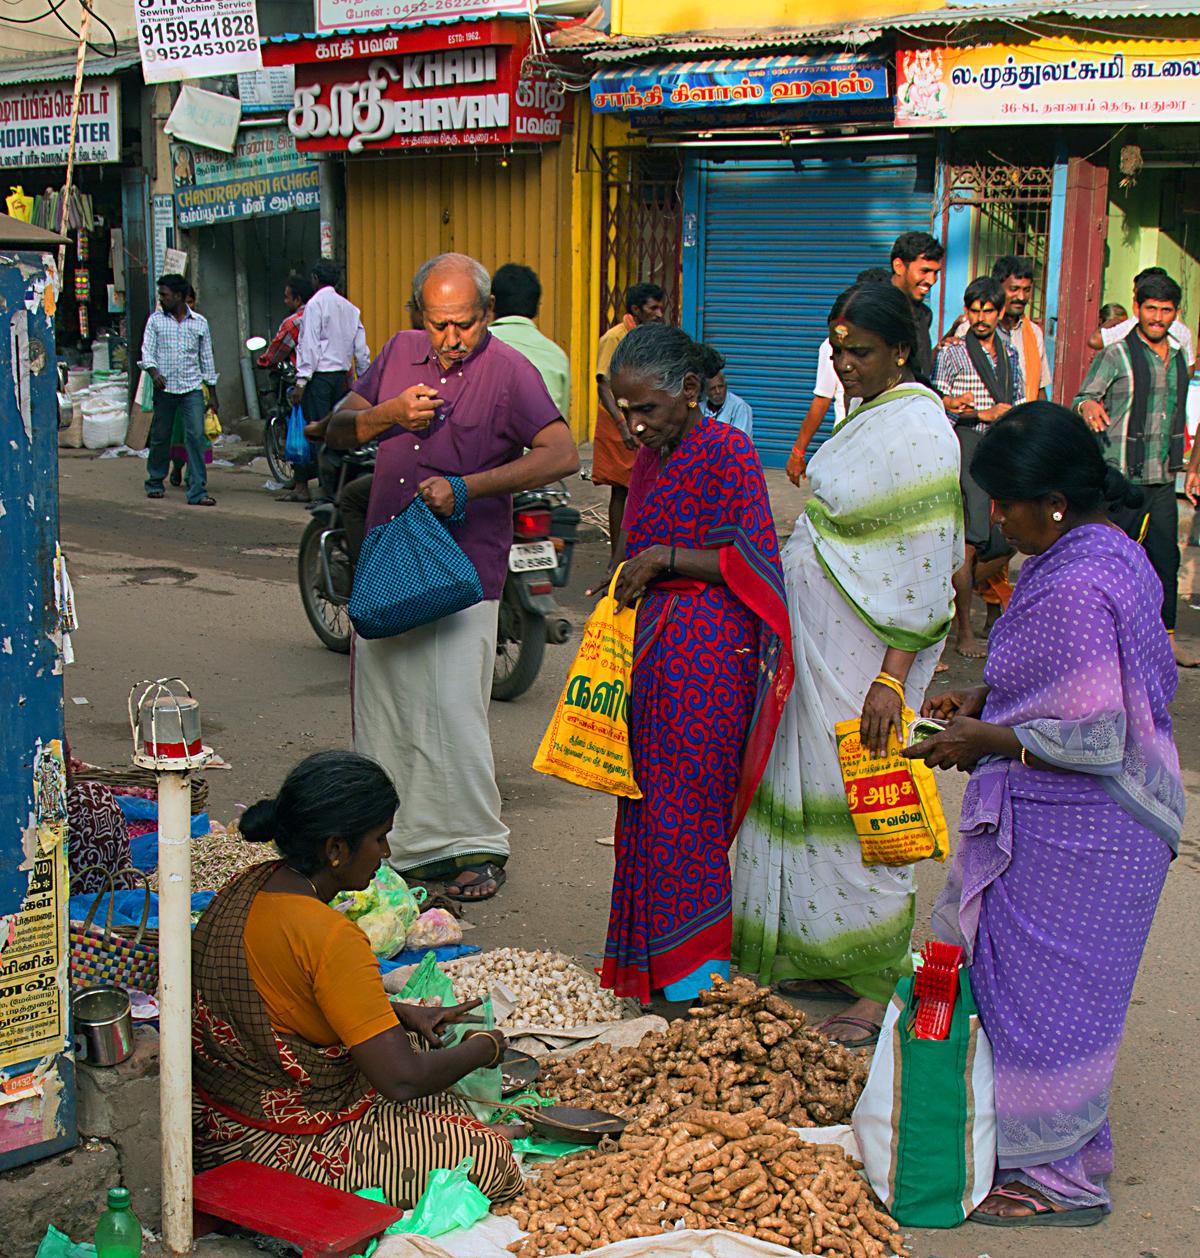 INDIEN Chennai Kanchipuram Tempel Menschen Tempel FINEST-onTour 7767.jpg